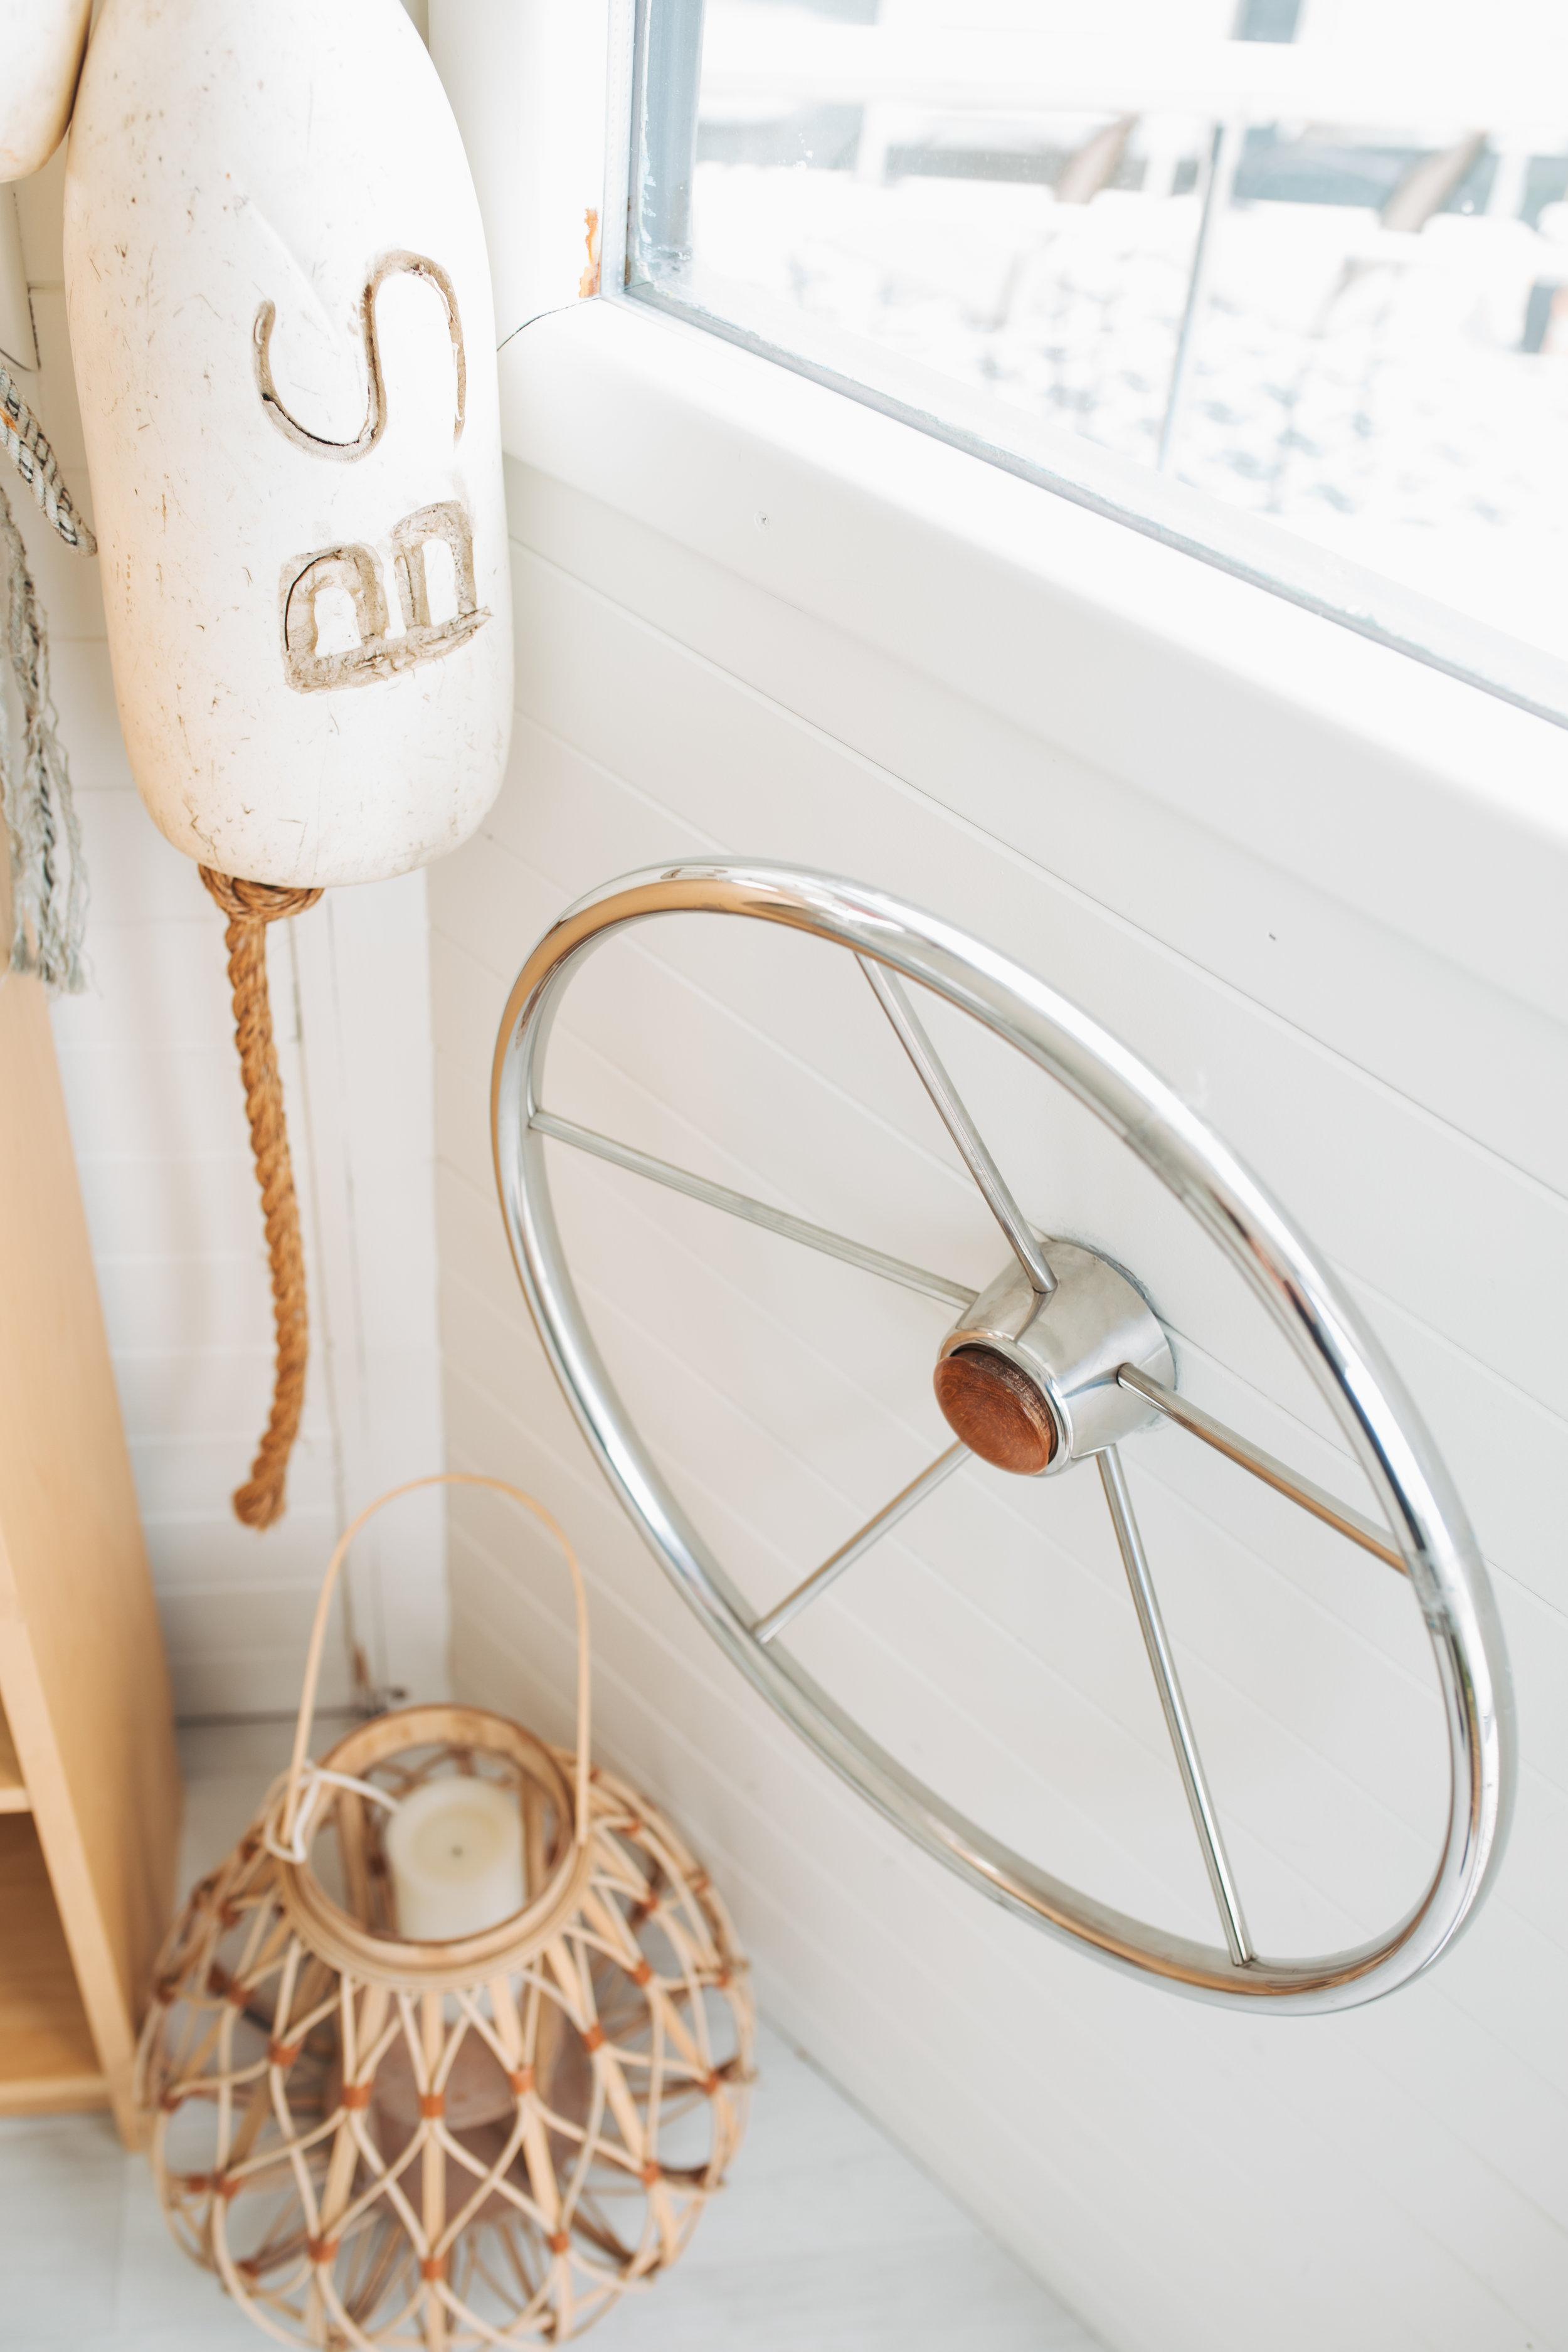 katherine_mendieta_seattle_lakeside_lovenest_houseboat-27.jpg